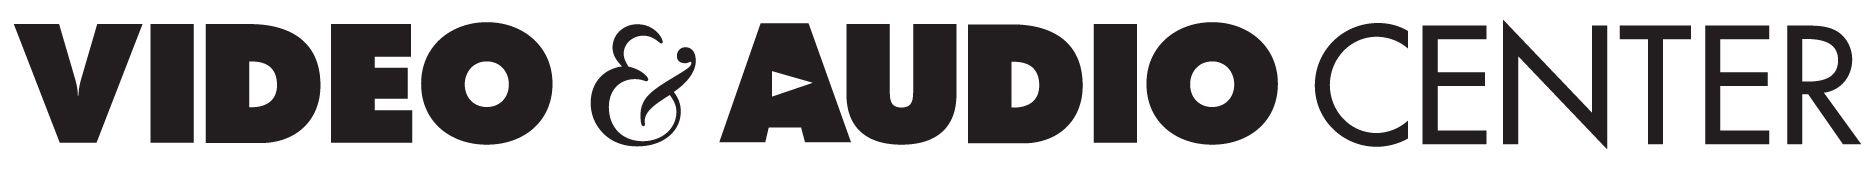 Video & Audio Center Logo